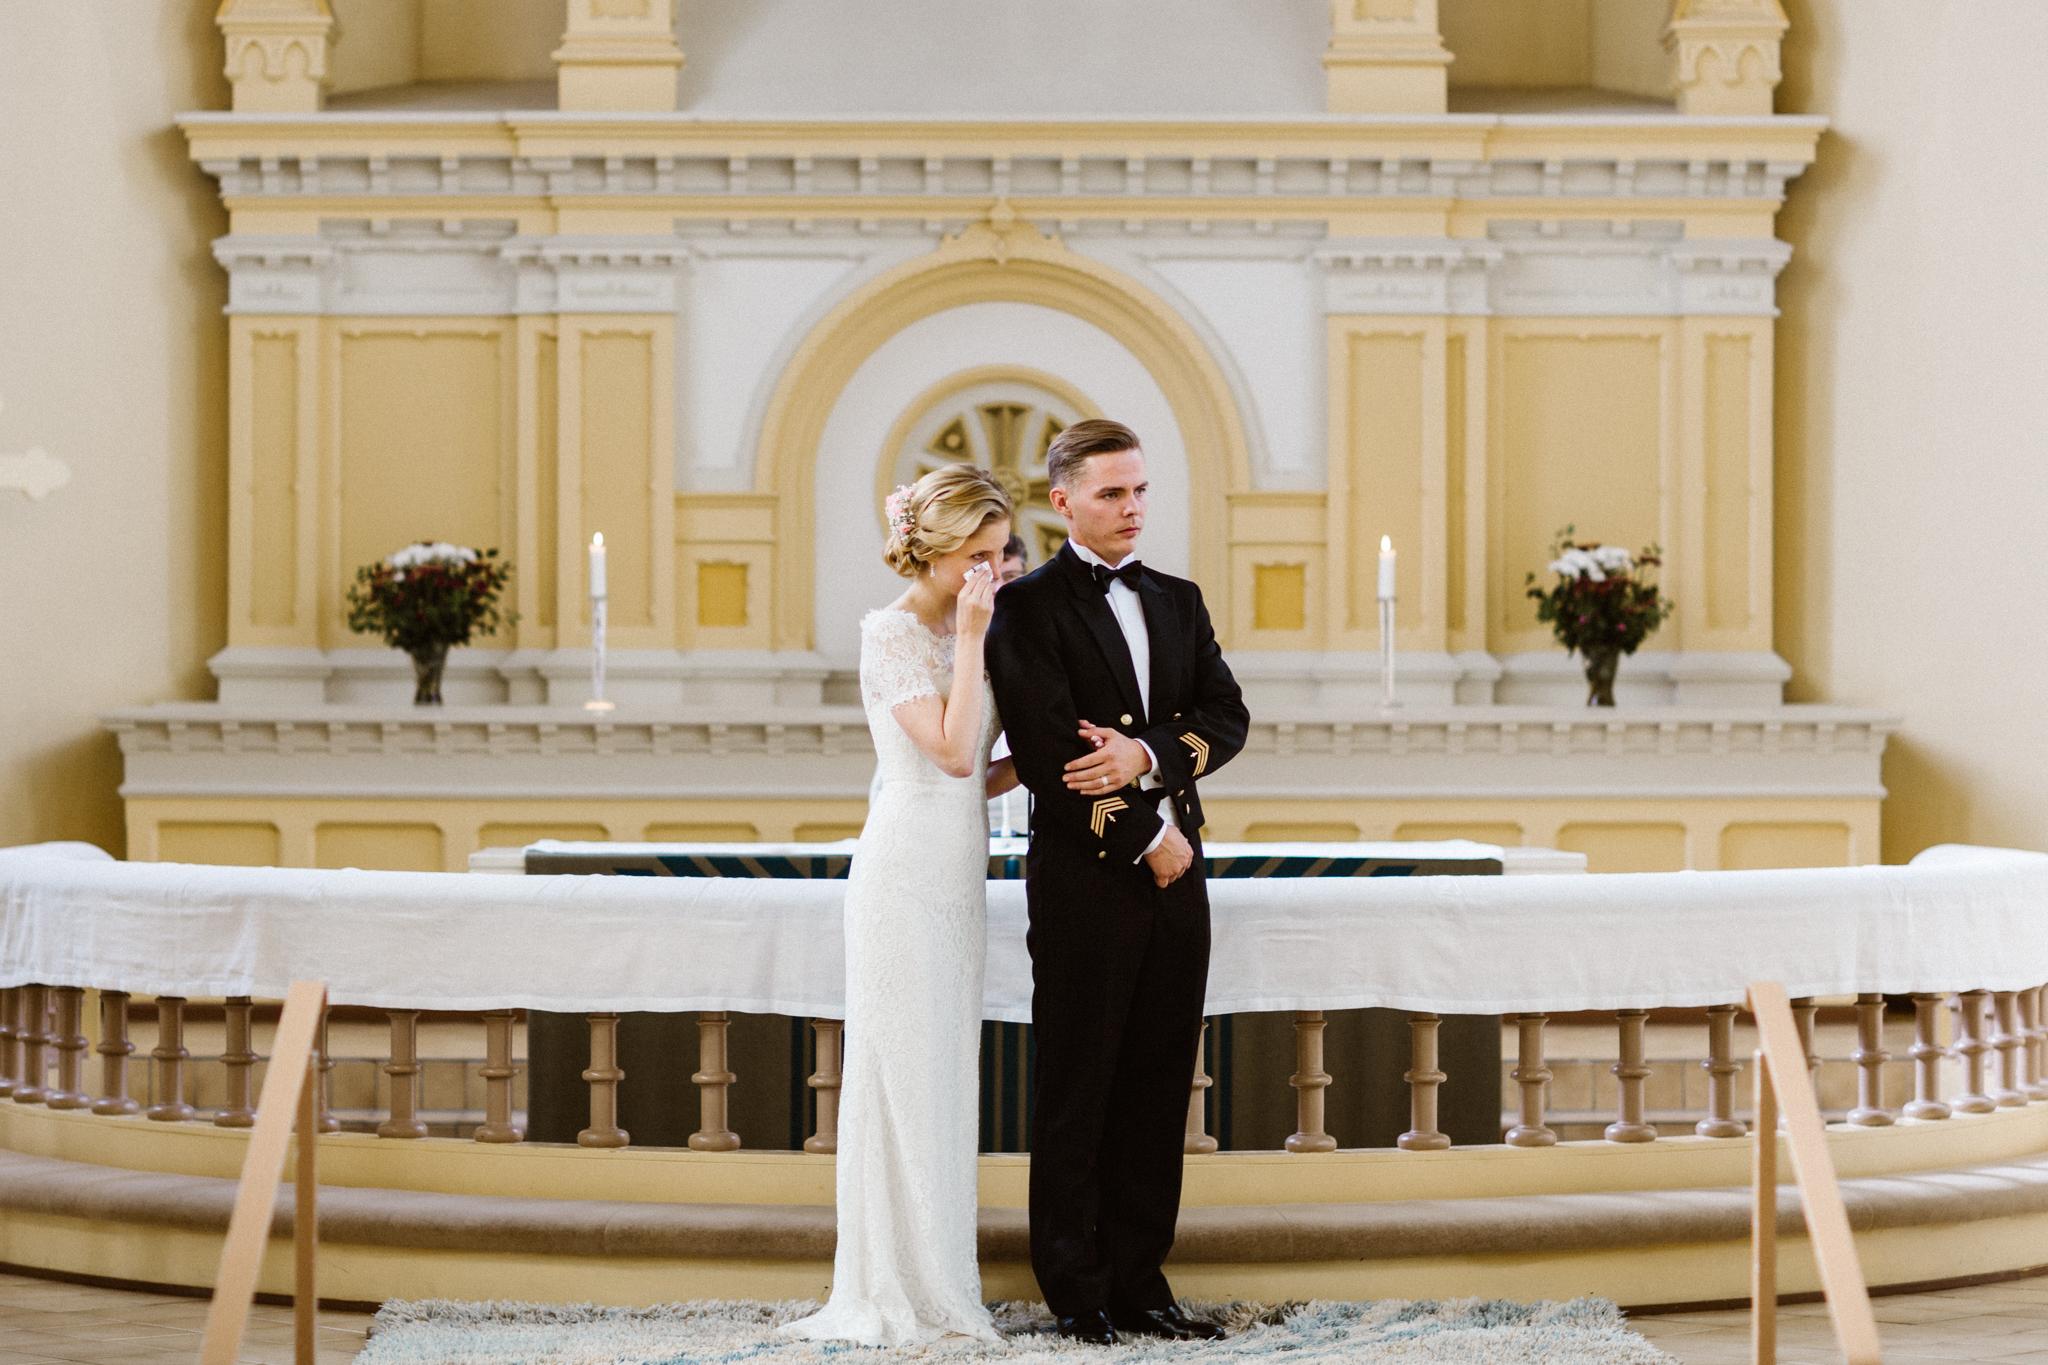 Pinja + Marko -- Patrick Karkkolainen Wedding Photographer-61.jpg